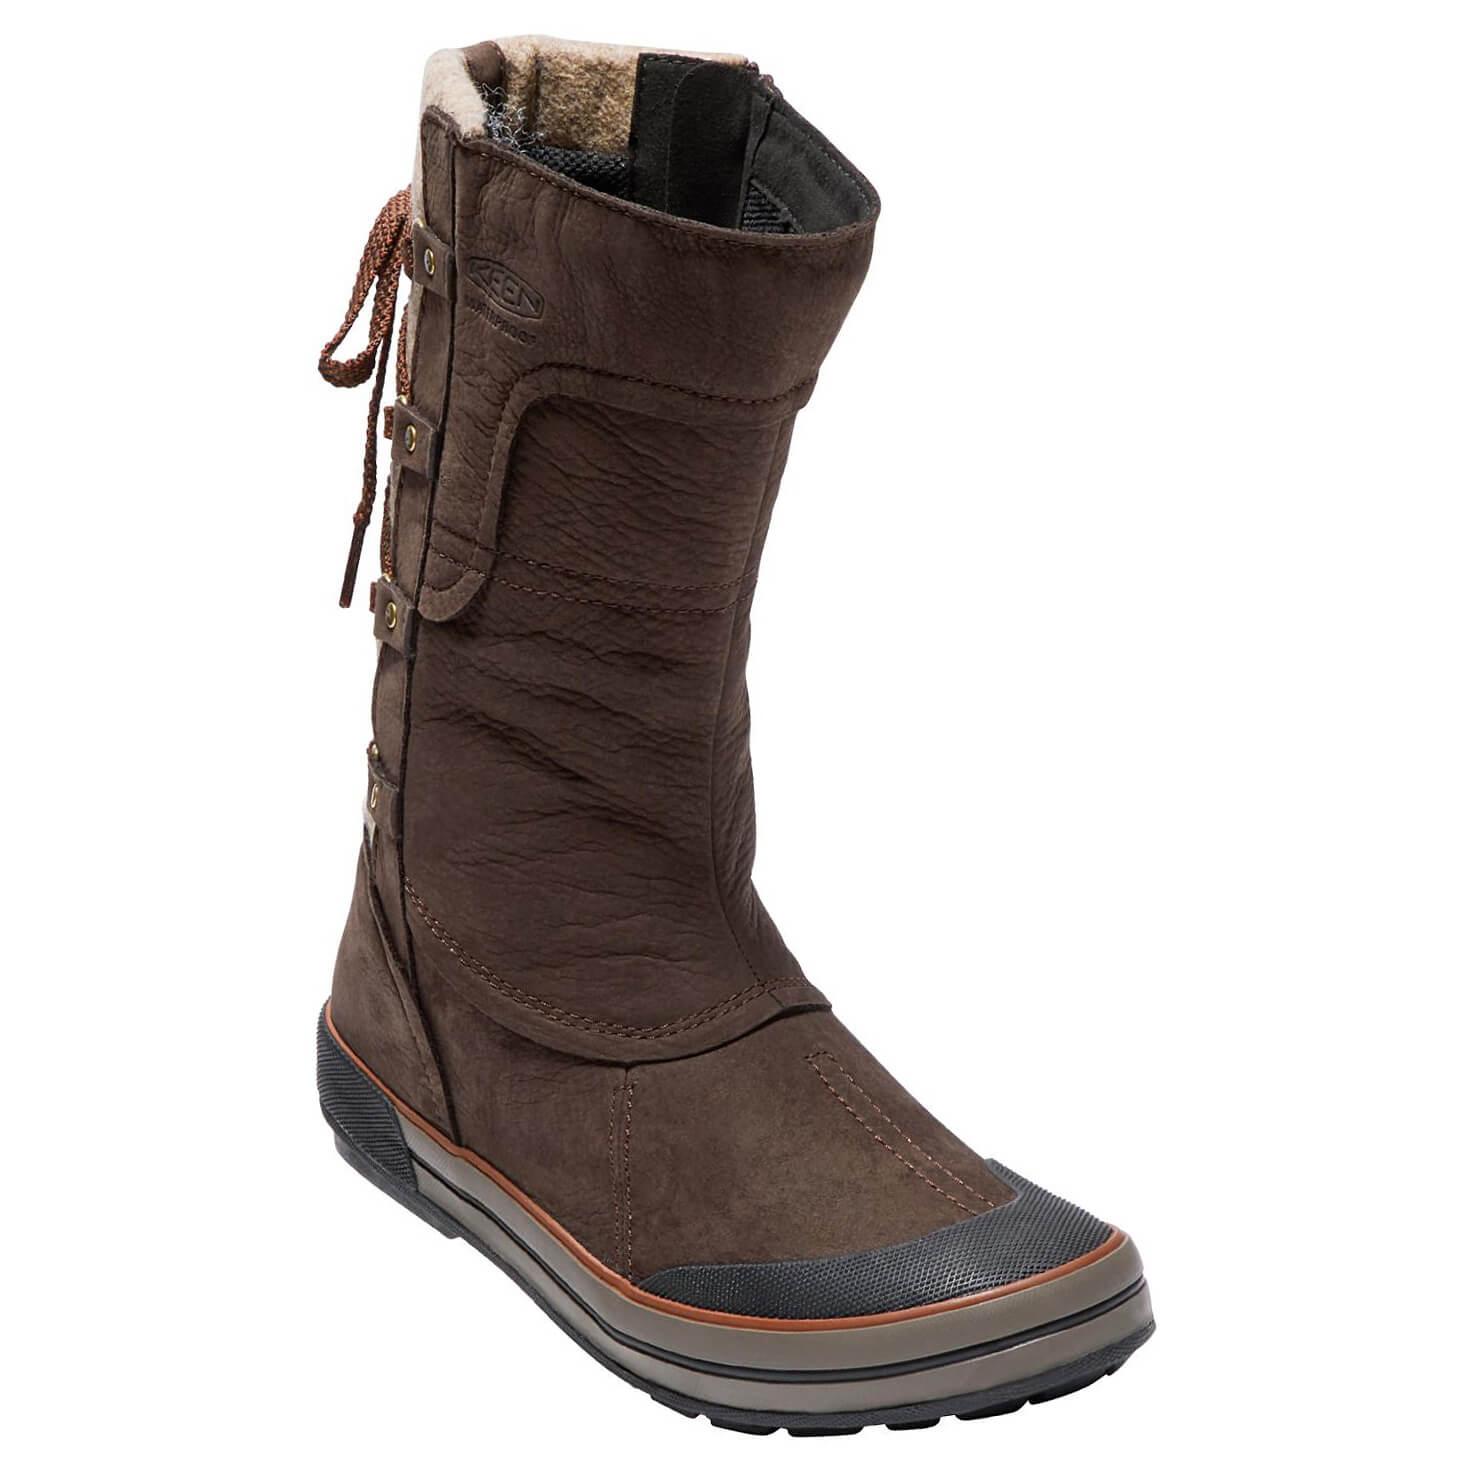 Elsa Botte Vif Wp W Chaussures D'hiver 4YBsVMVlX